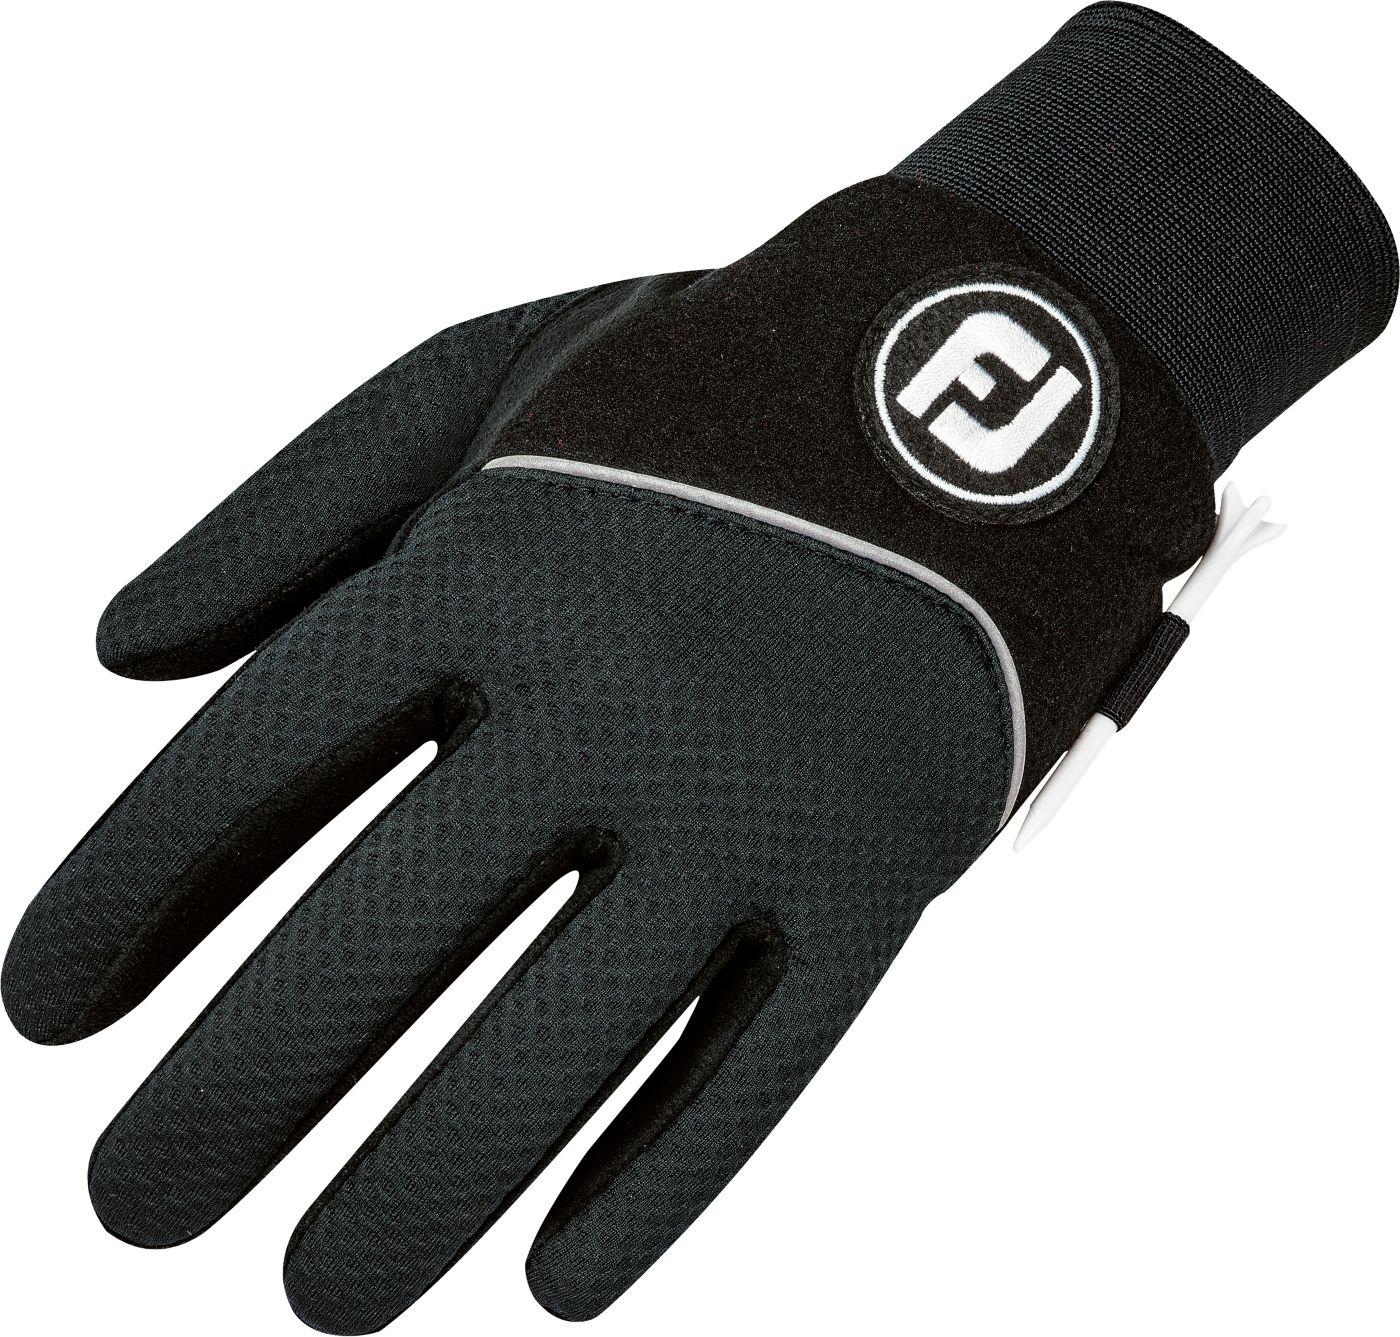 FootJoy Men's WinterSof Golf Gloves - Pair